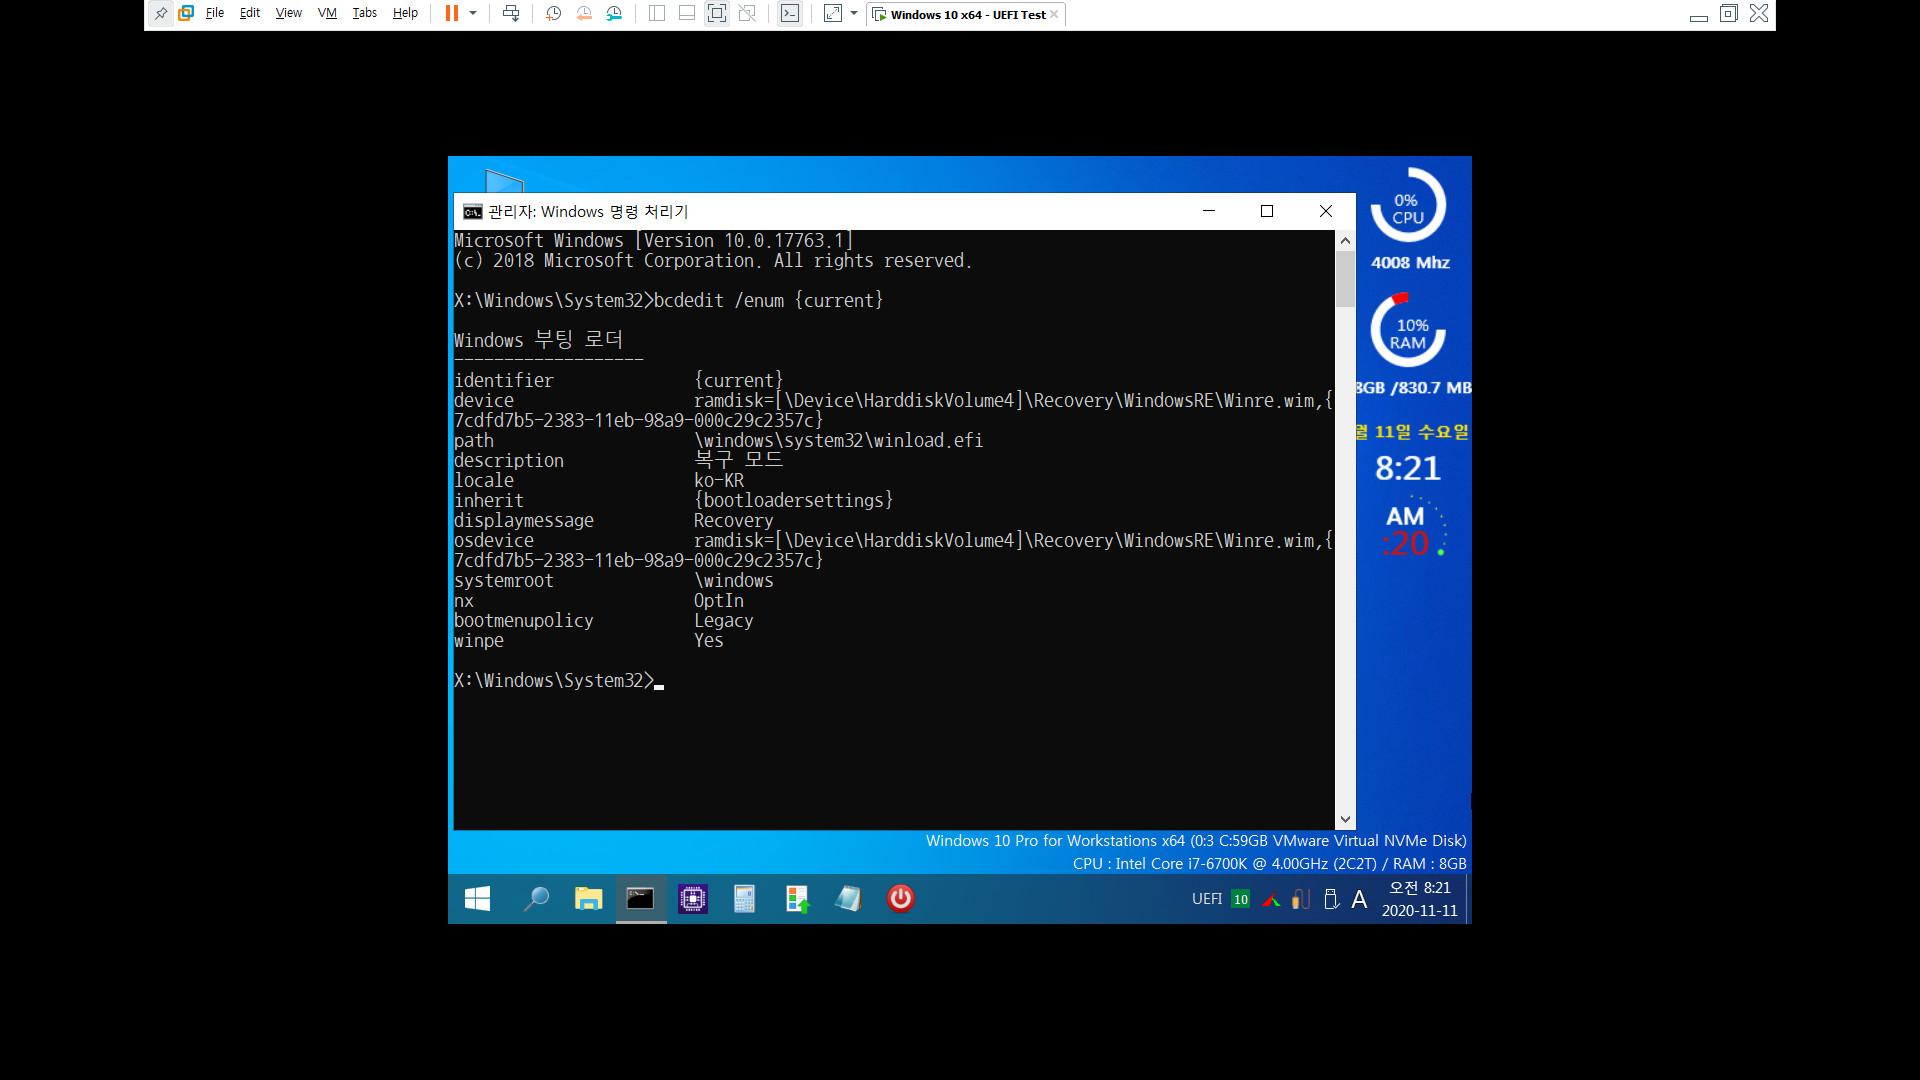 Winre.wim [복구 모드] 재구성하기 3 - 복구파티션 포함 [2020-11-11].bat 테스트 2020-11-11_082121.jpg